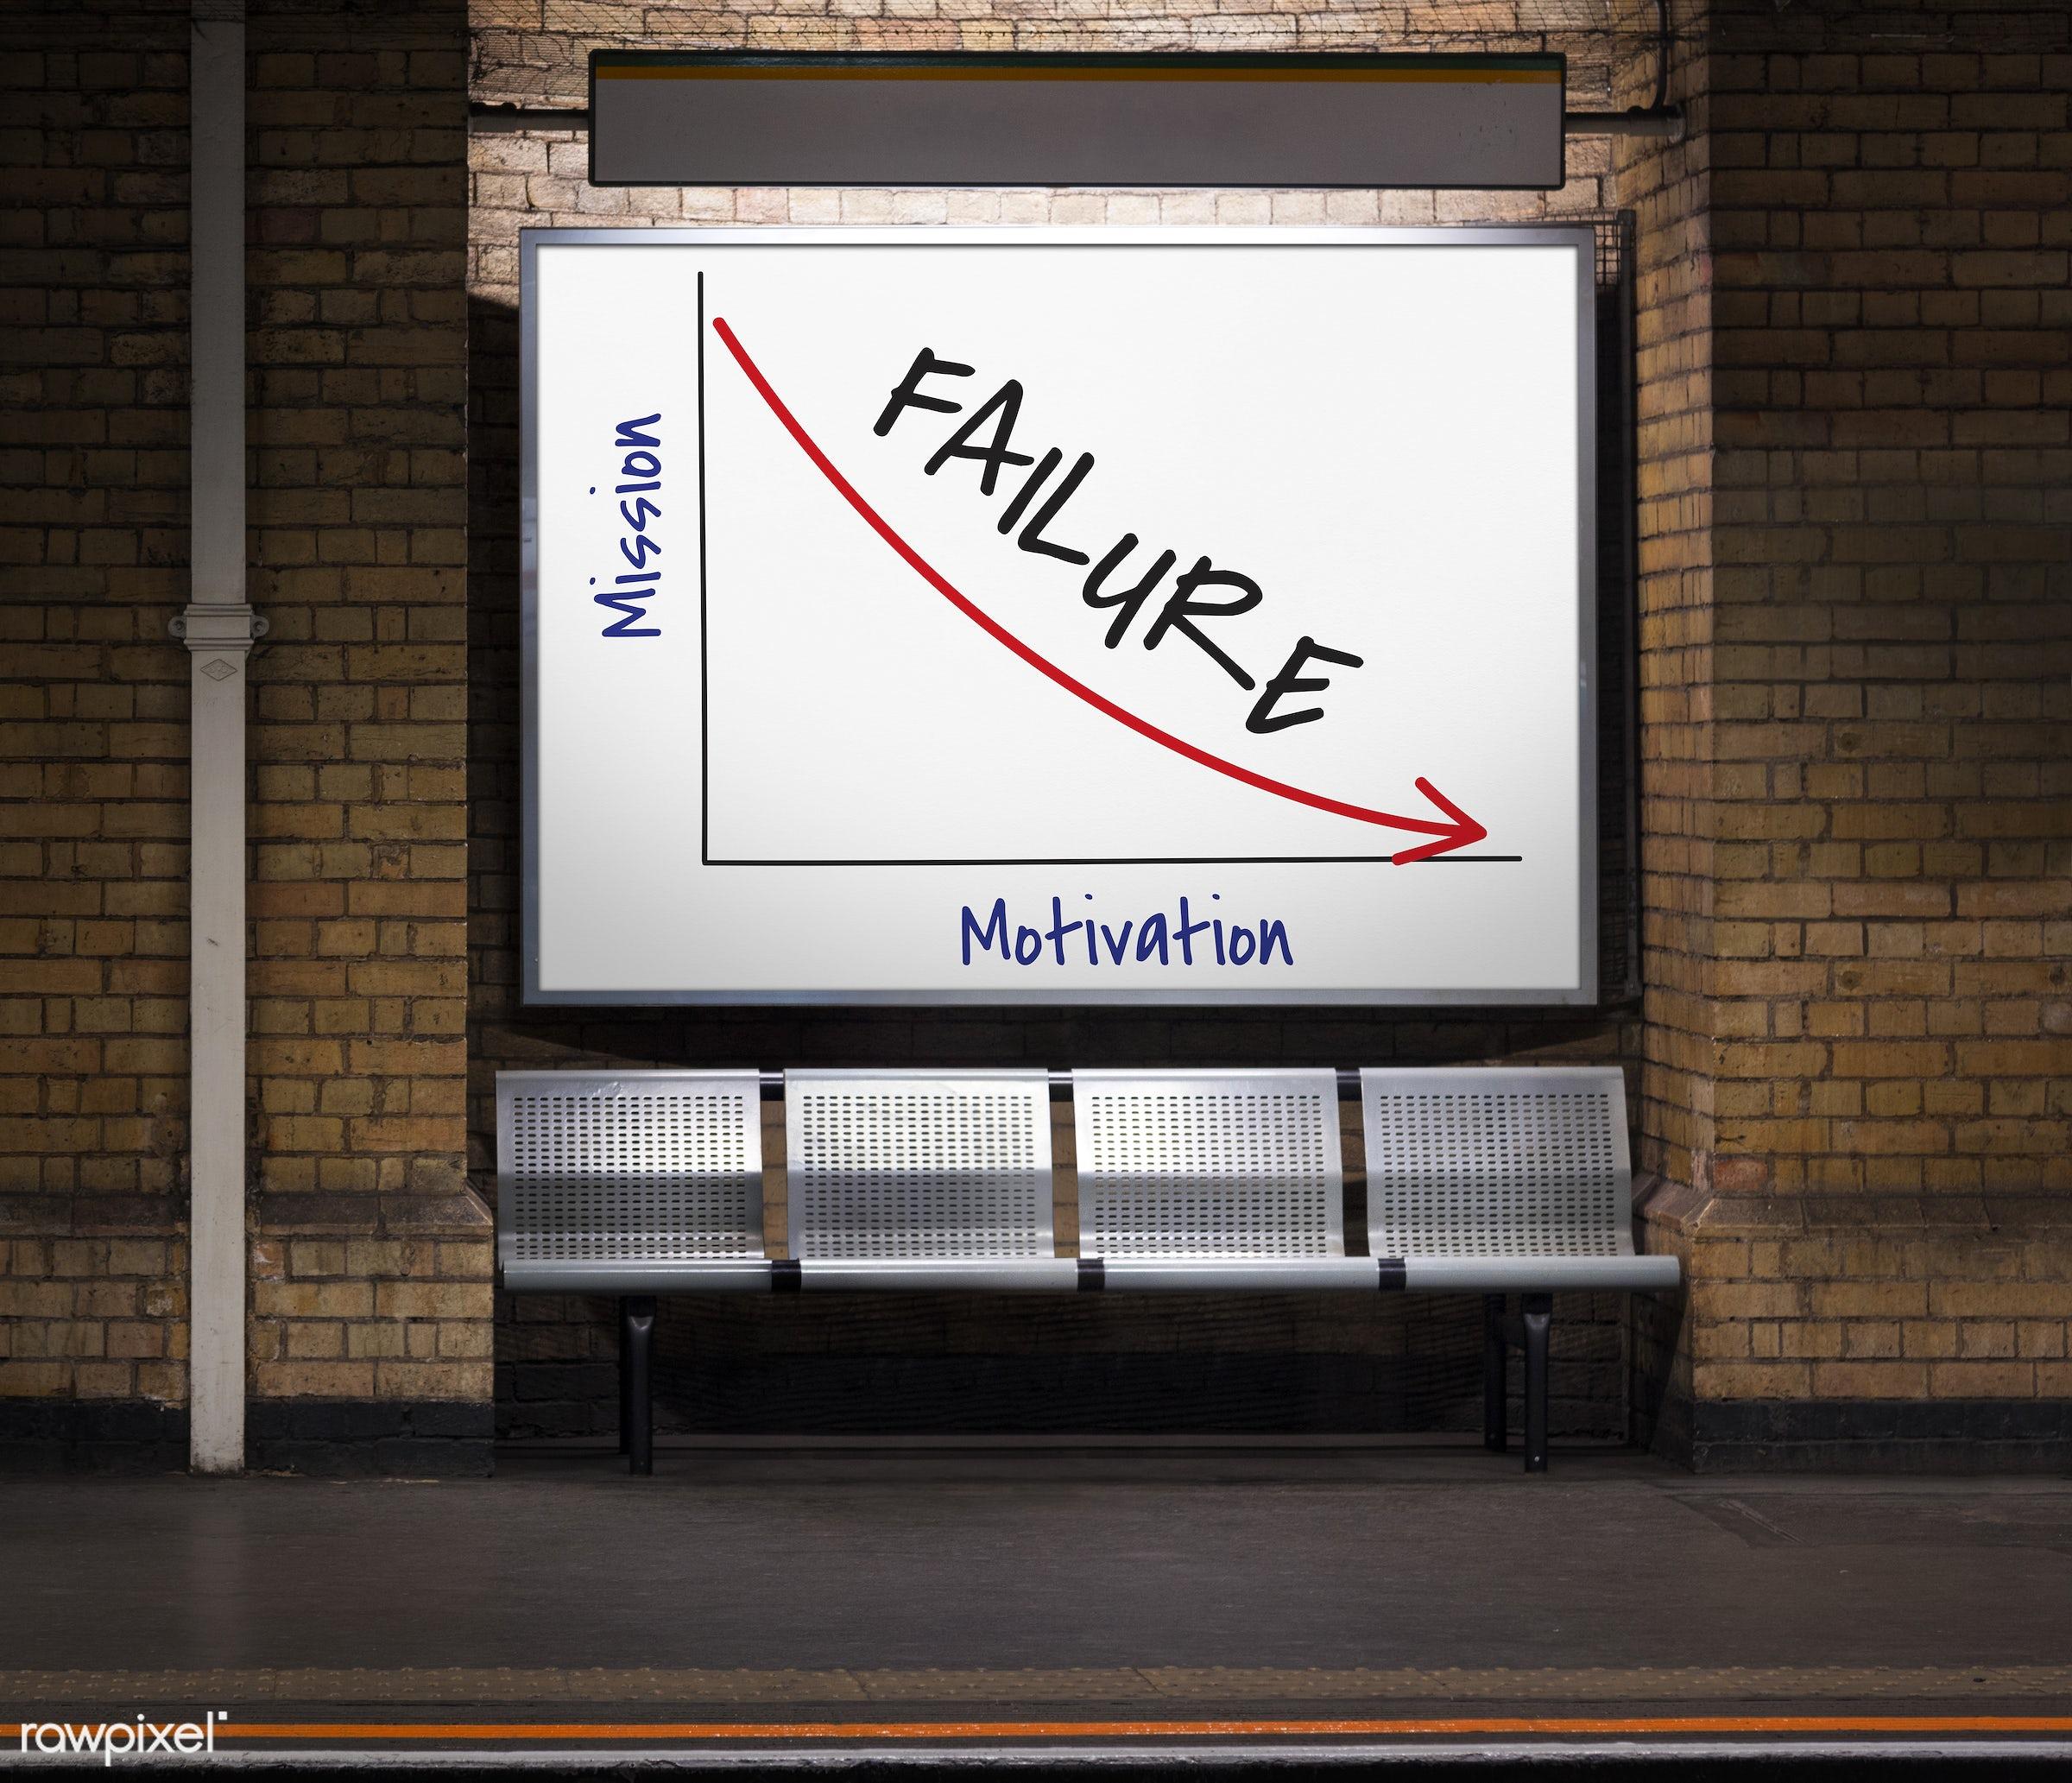 bricks, brickswall, business, career, cease, cessation, crisis, decreasing, drop, employment, fail, failed, failure, falling...